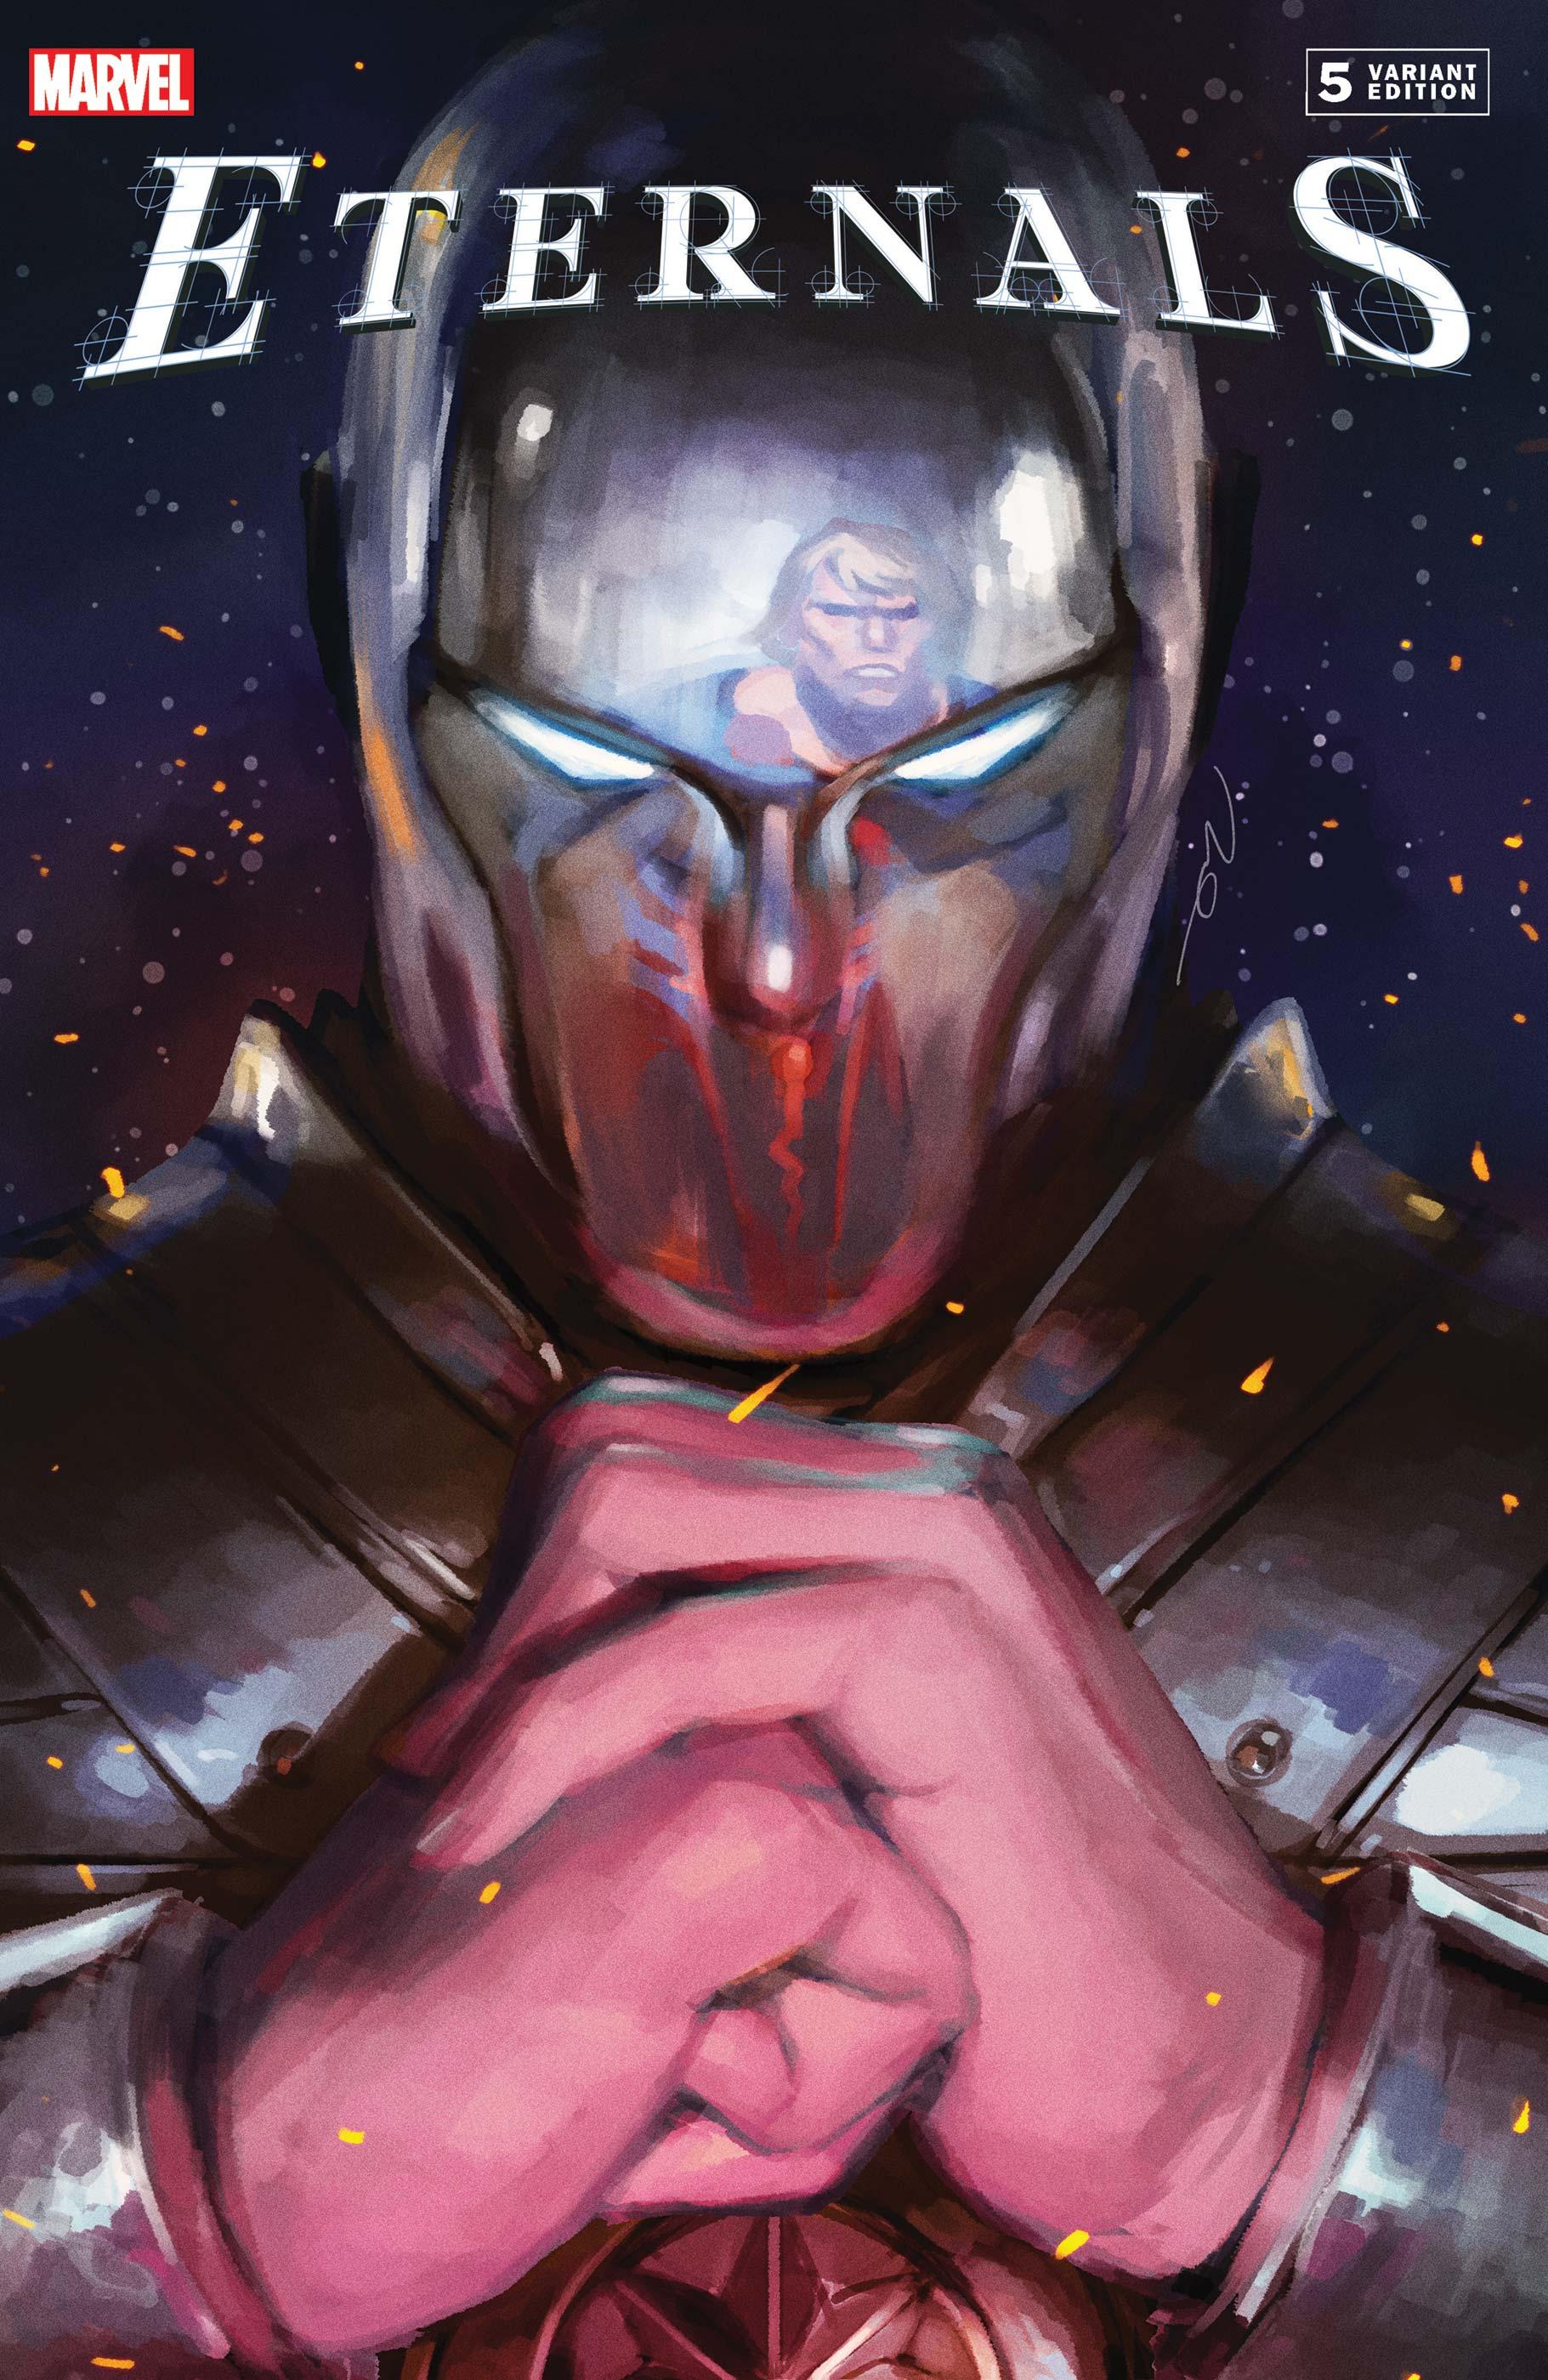 Eternals (2021) #5 (Variant)